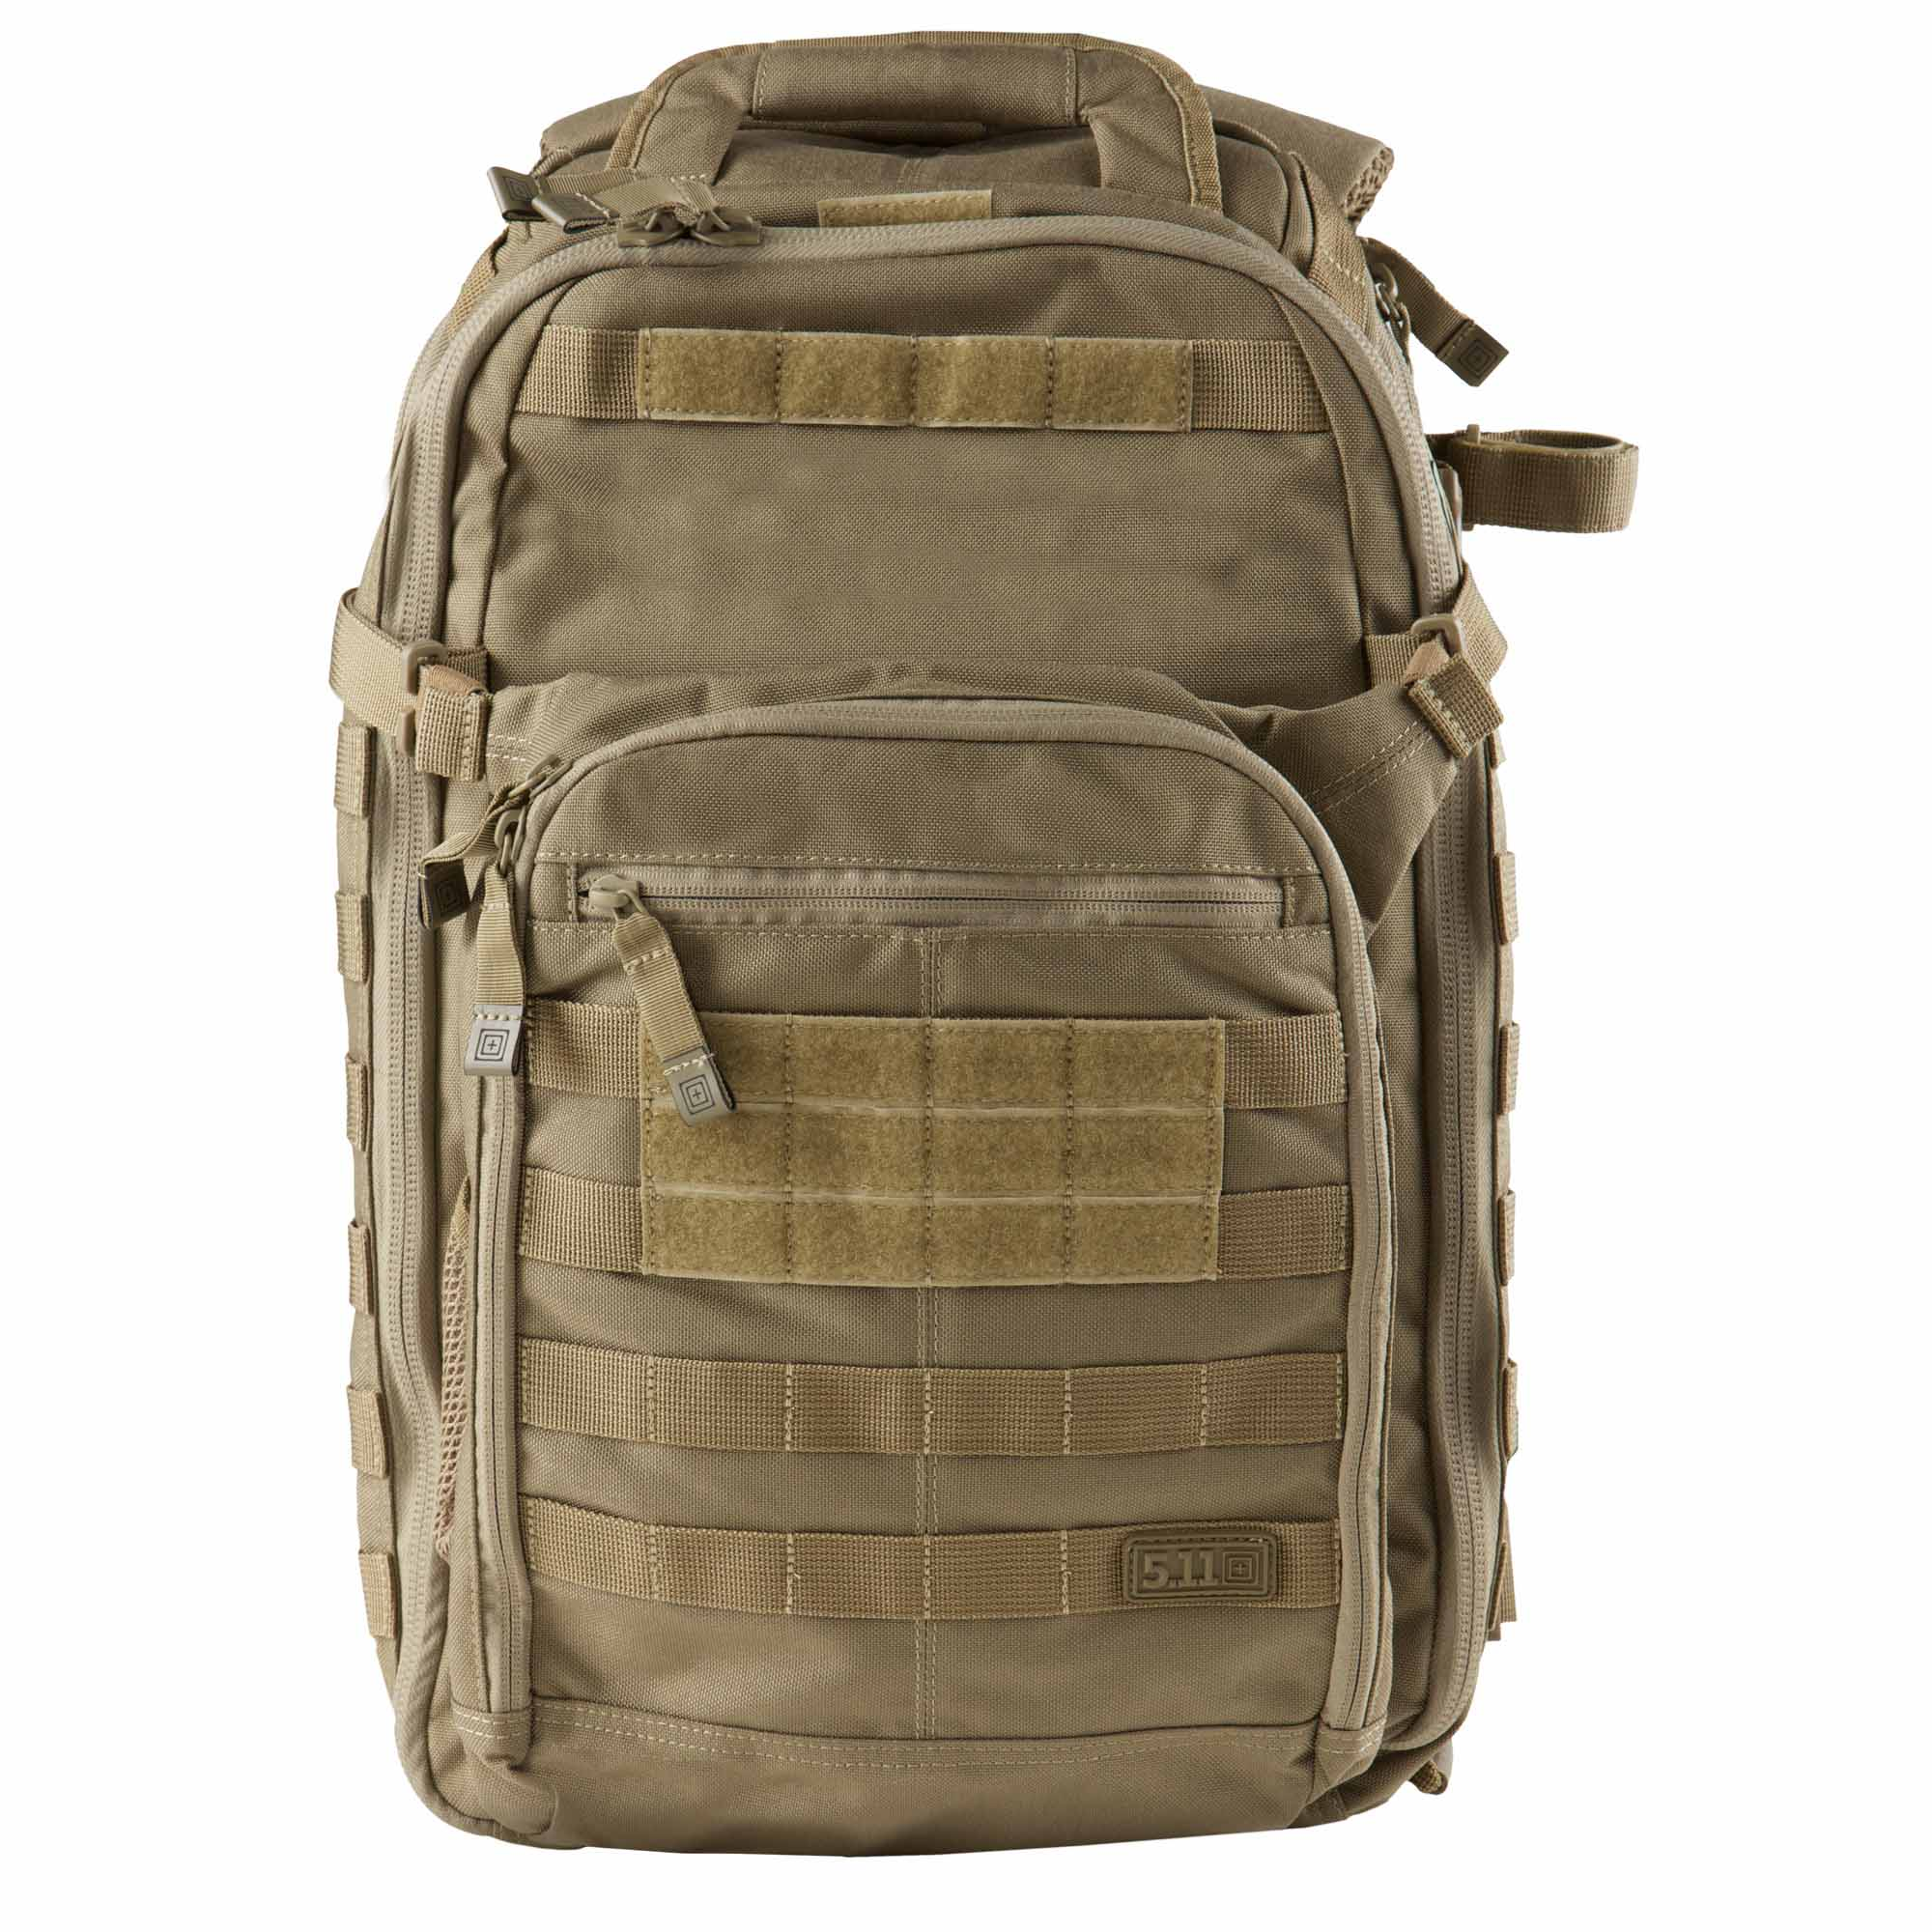 f106feeb84c1 5.11 Tactical RUSH 24 Tactical Backpack - 5.11 Tactical